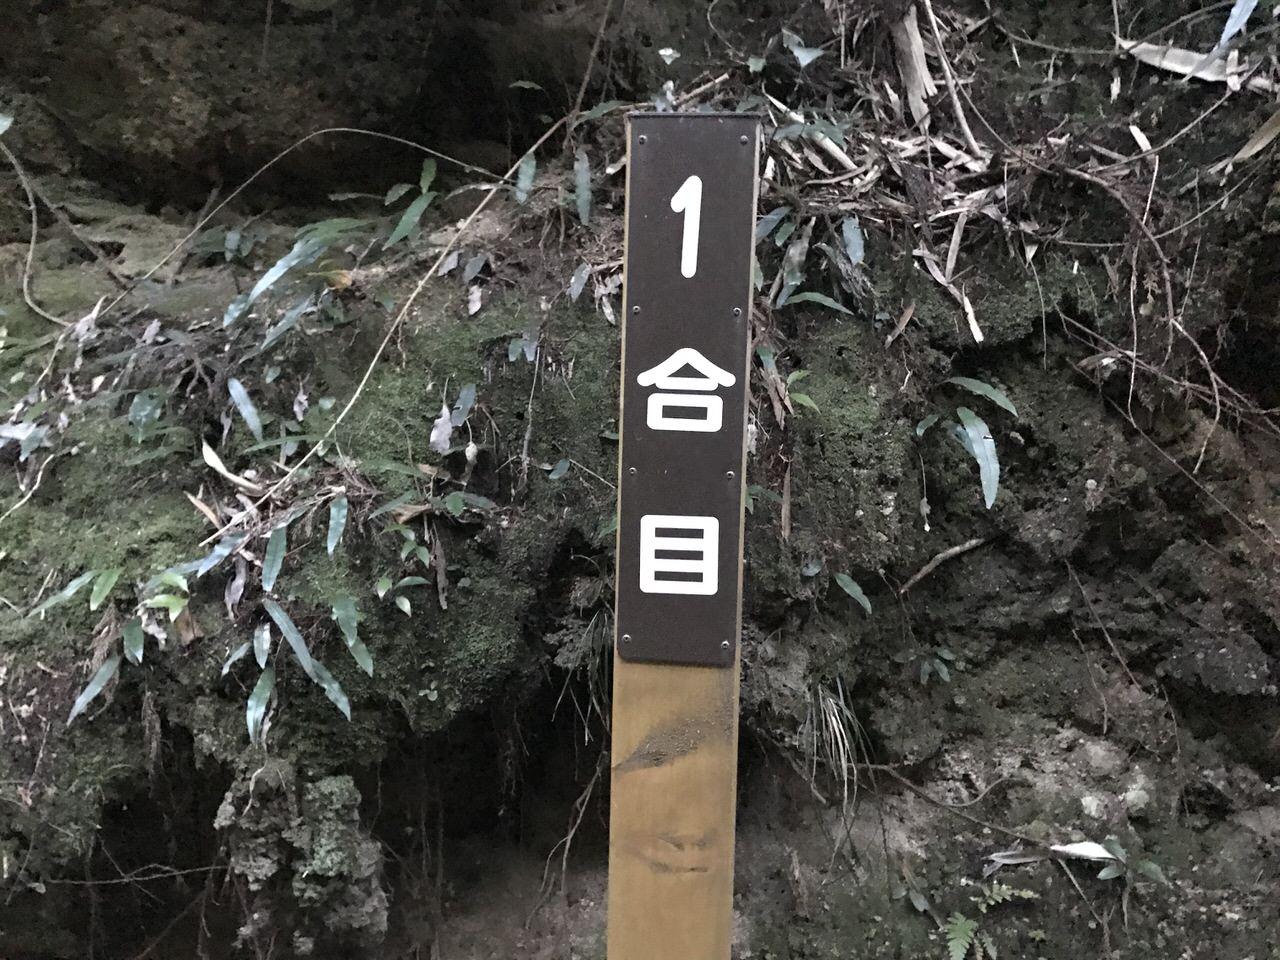 Kozushima tamashima 4810